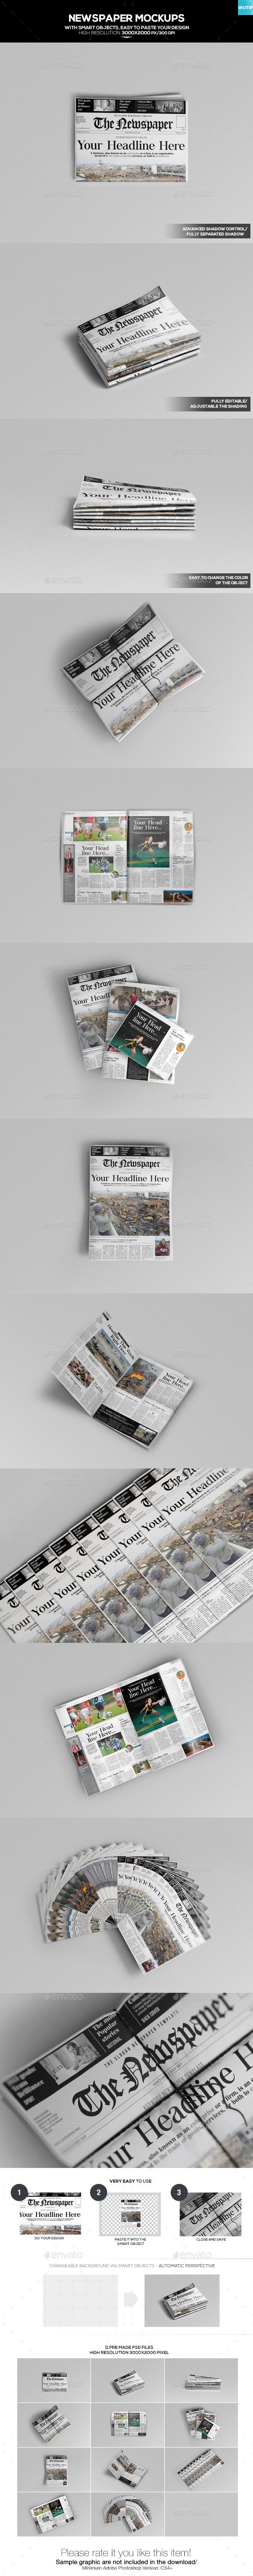 Newspaper Mockups 01 - Miscellaneous Print